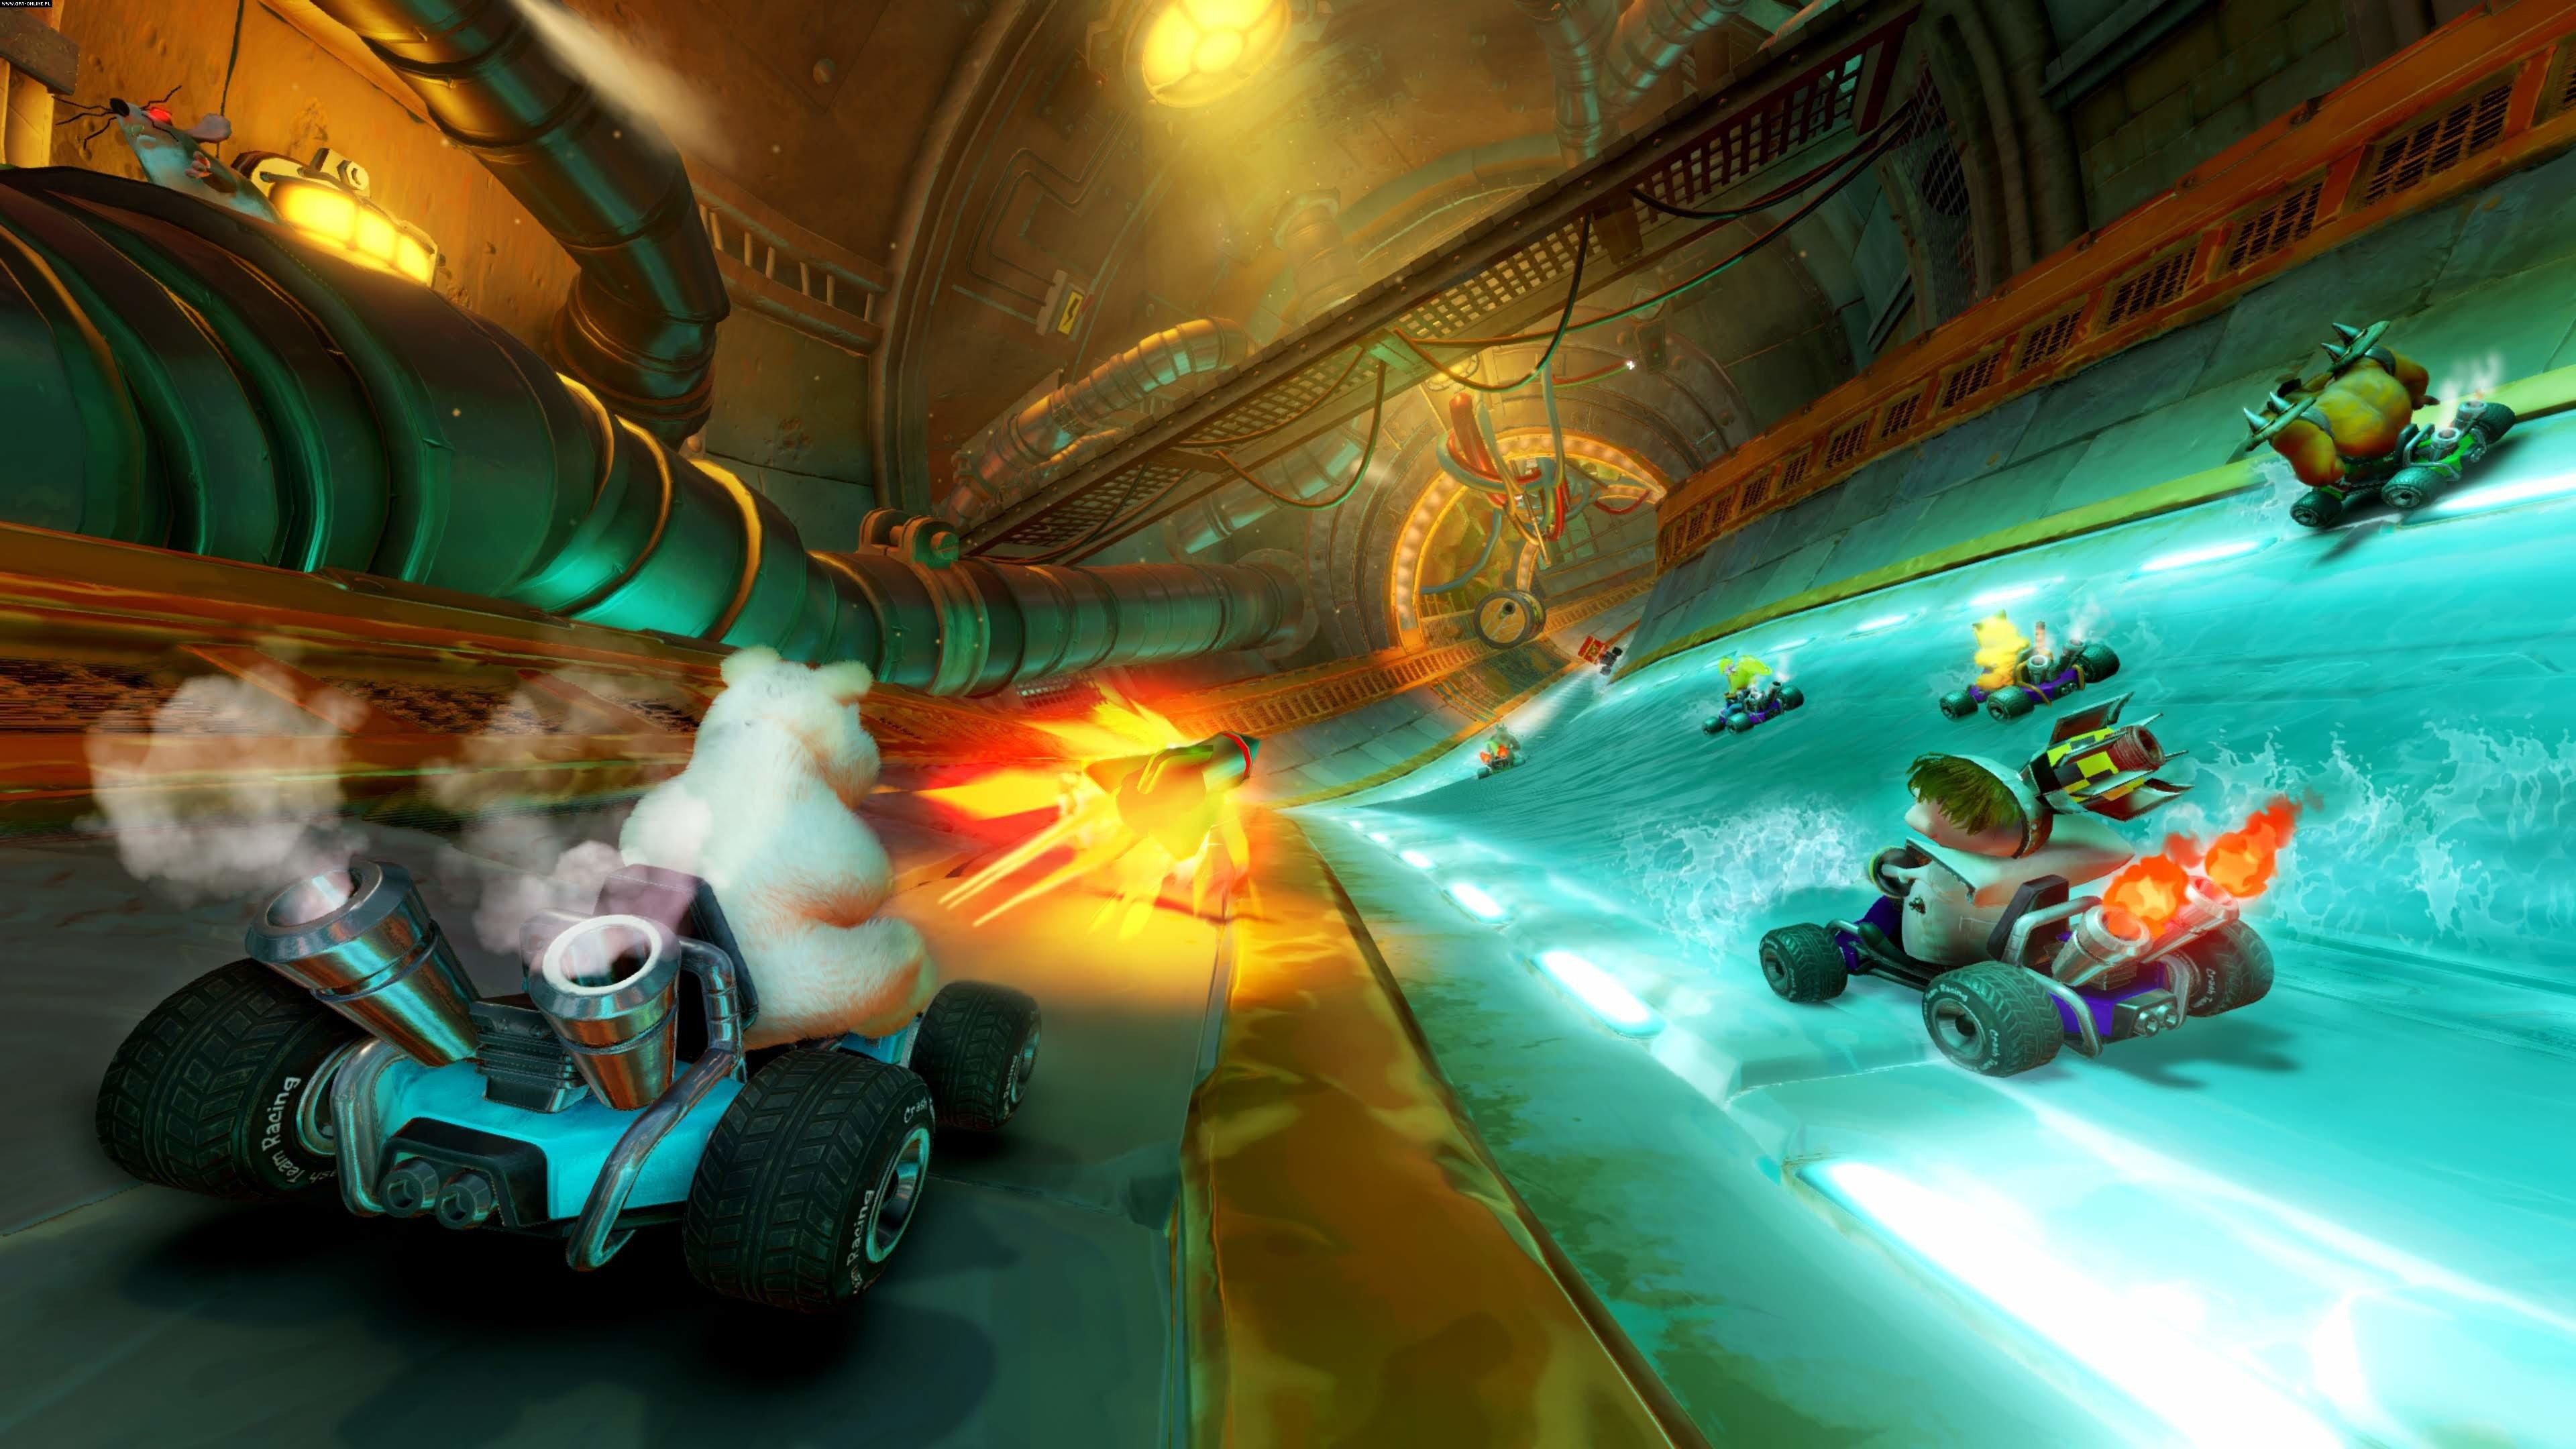 Crash Team Racing Nitro-Fueled PS4 Games Image 3/24, Beenox Inc., Activision Blizzard